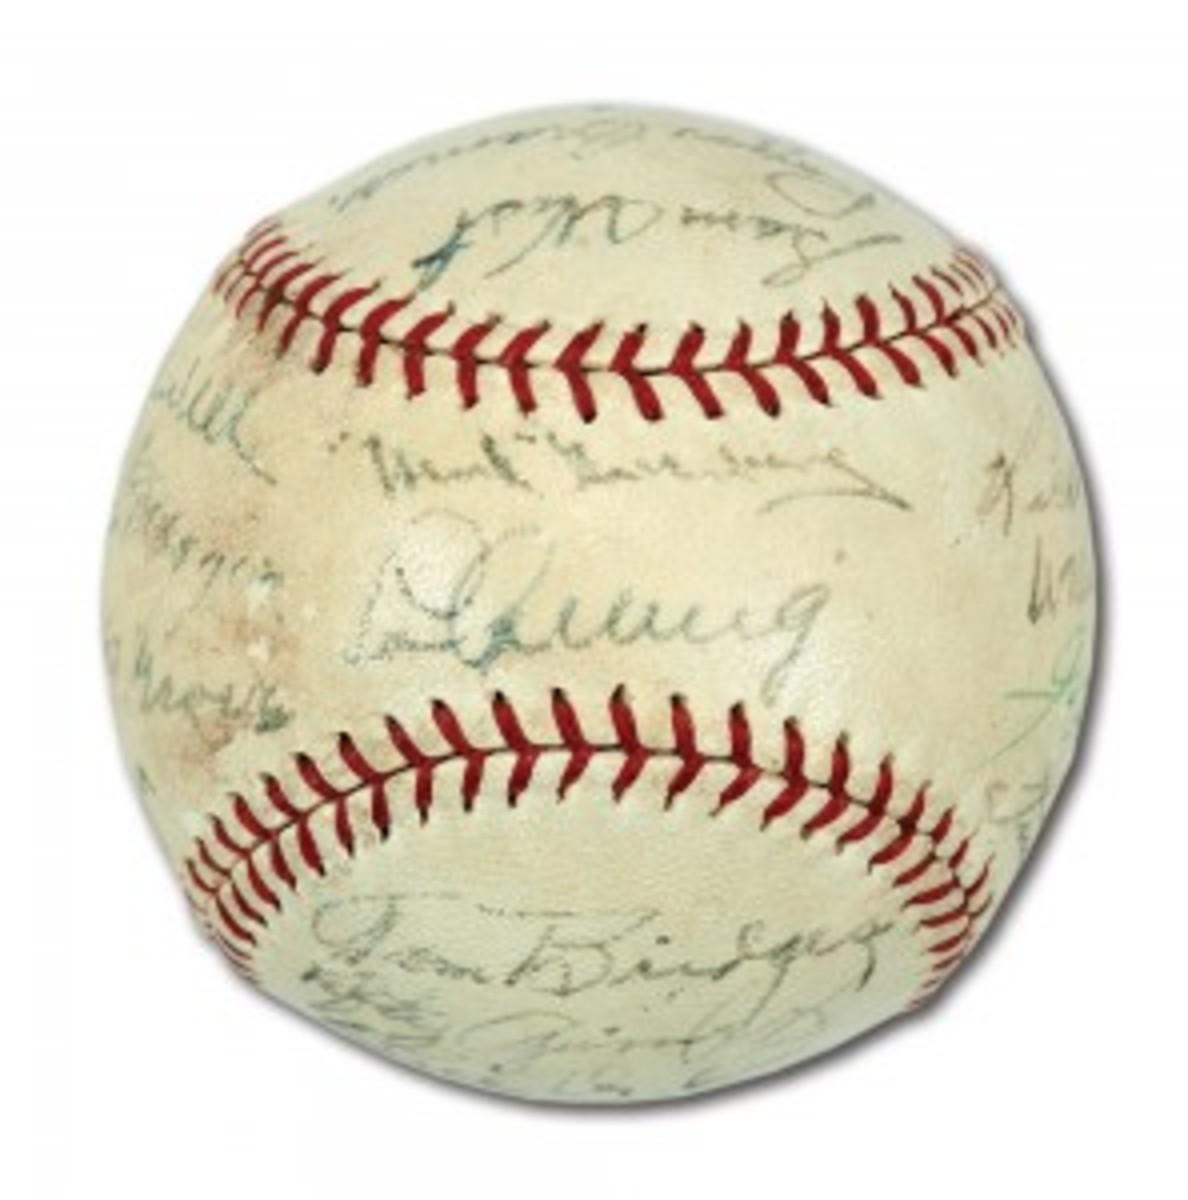 '37 Yankees Baseball